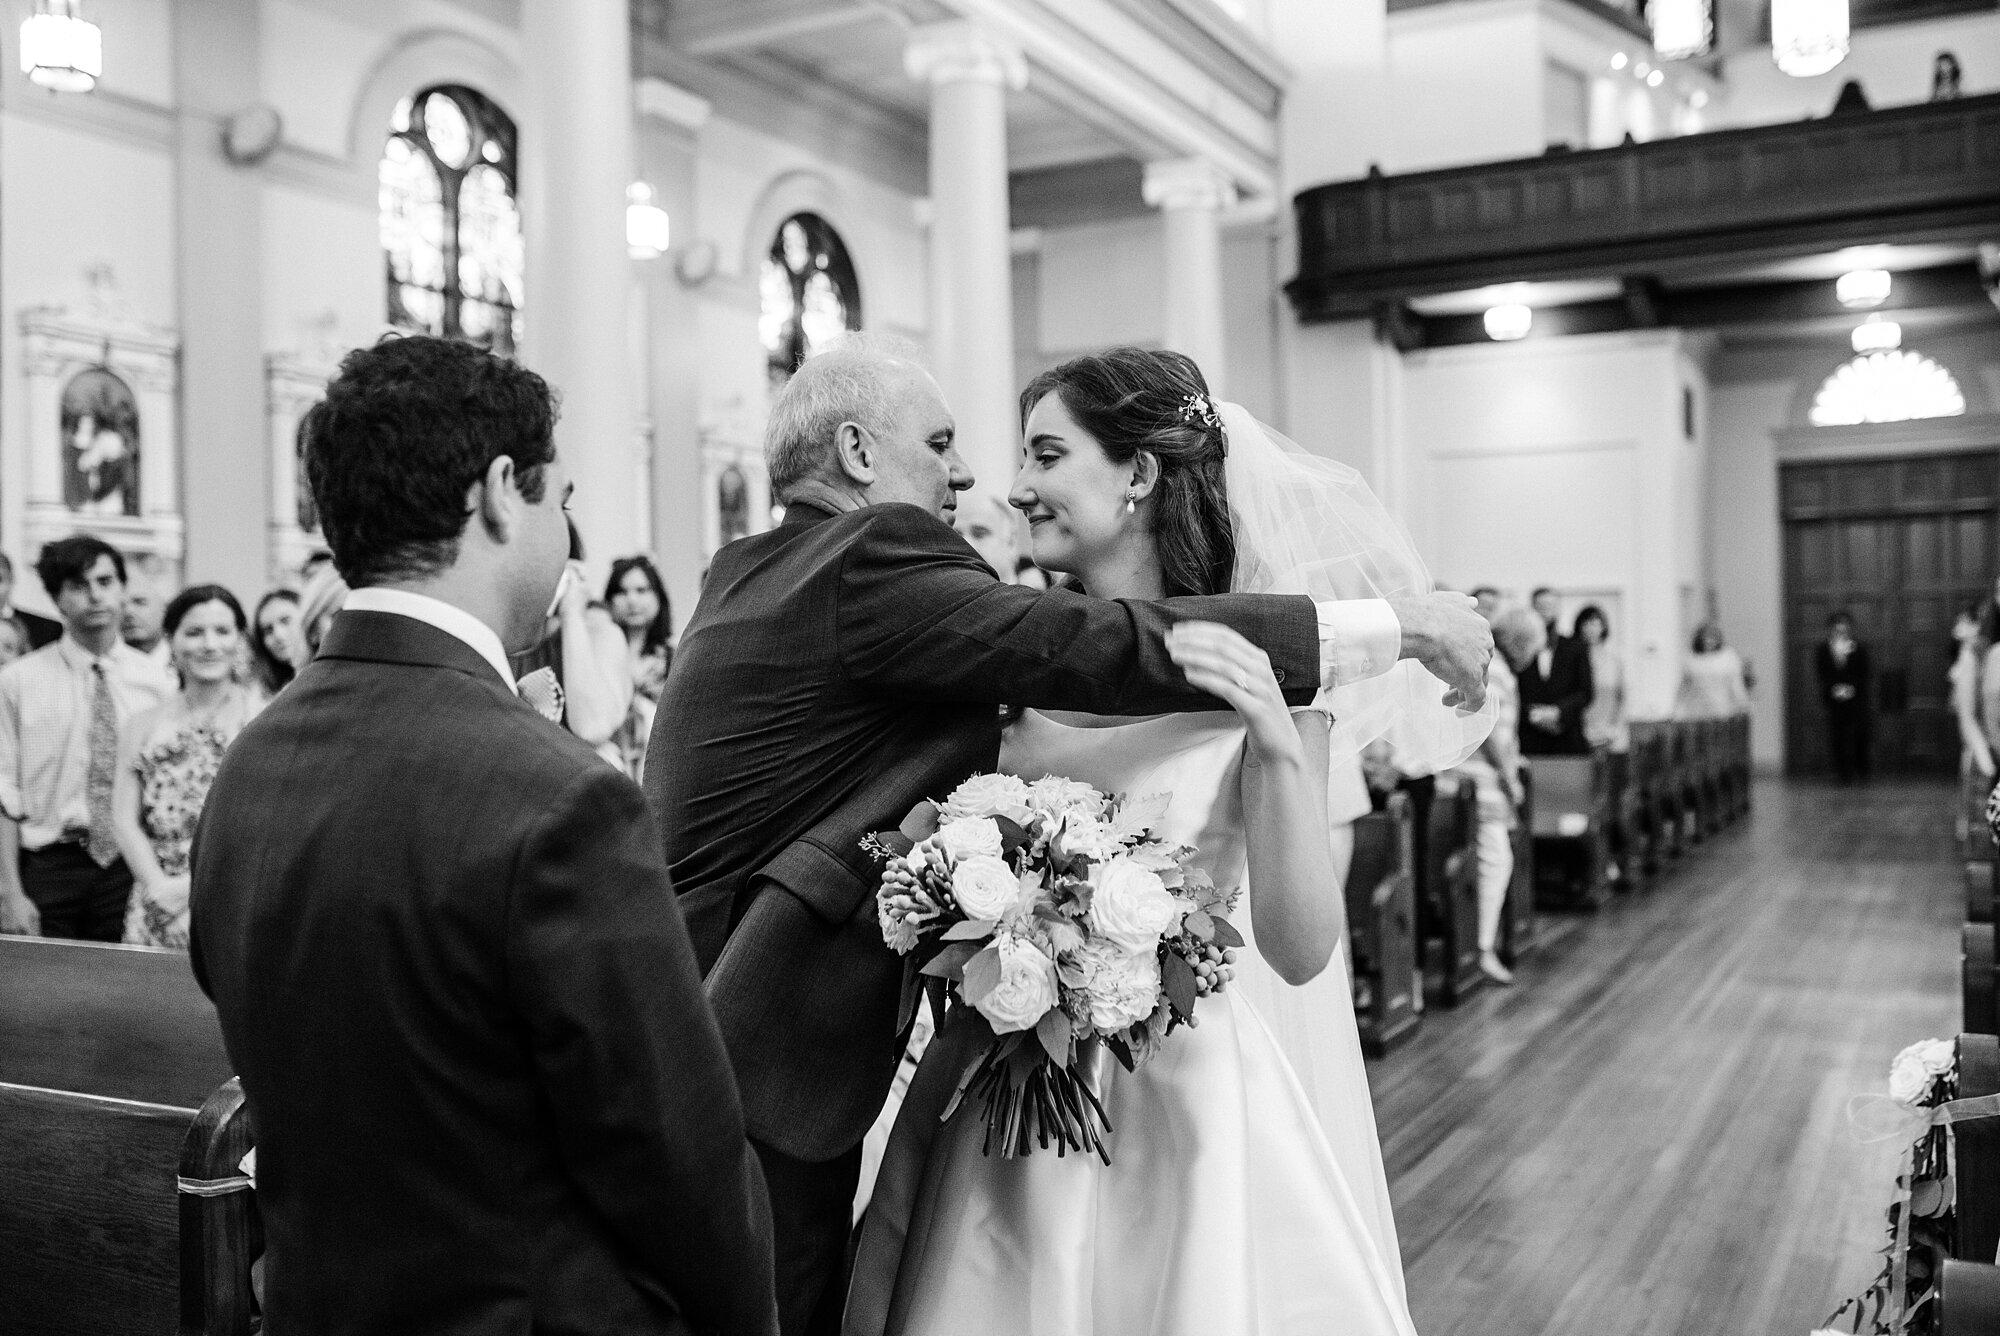 Bay_St_Louis_Wedding_Photographer_0523.jpg